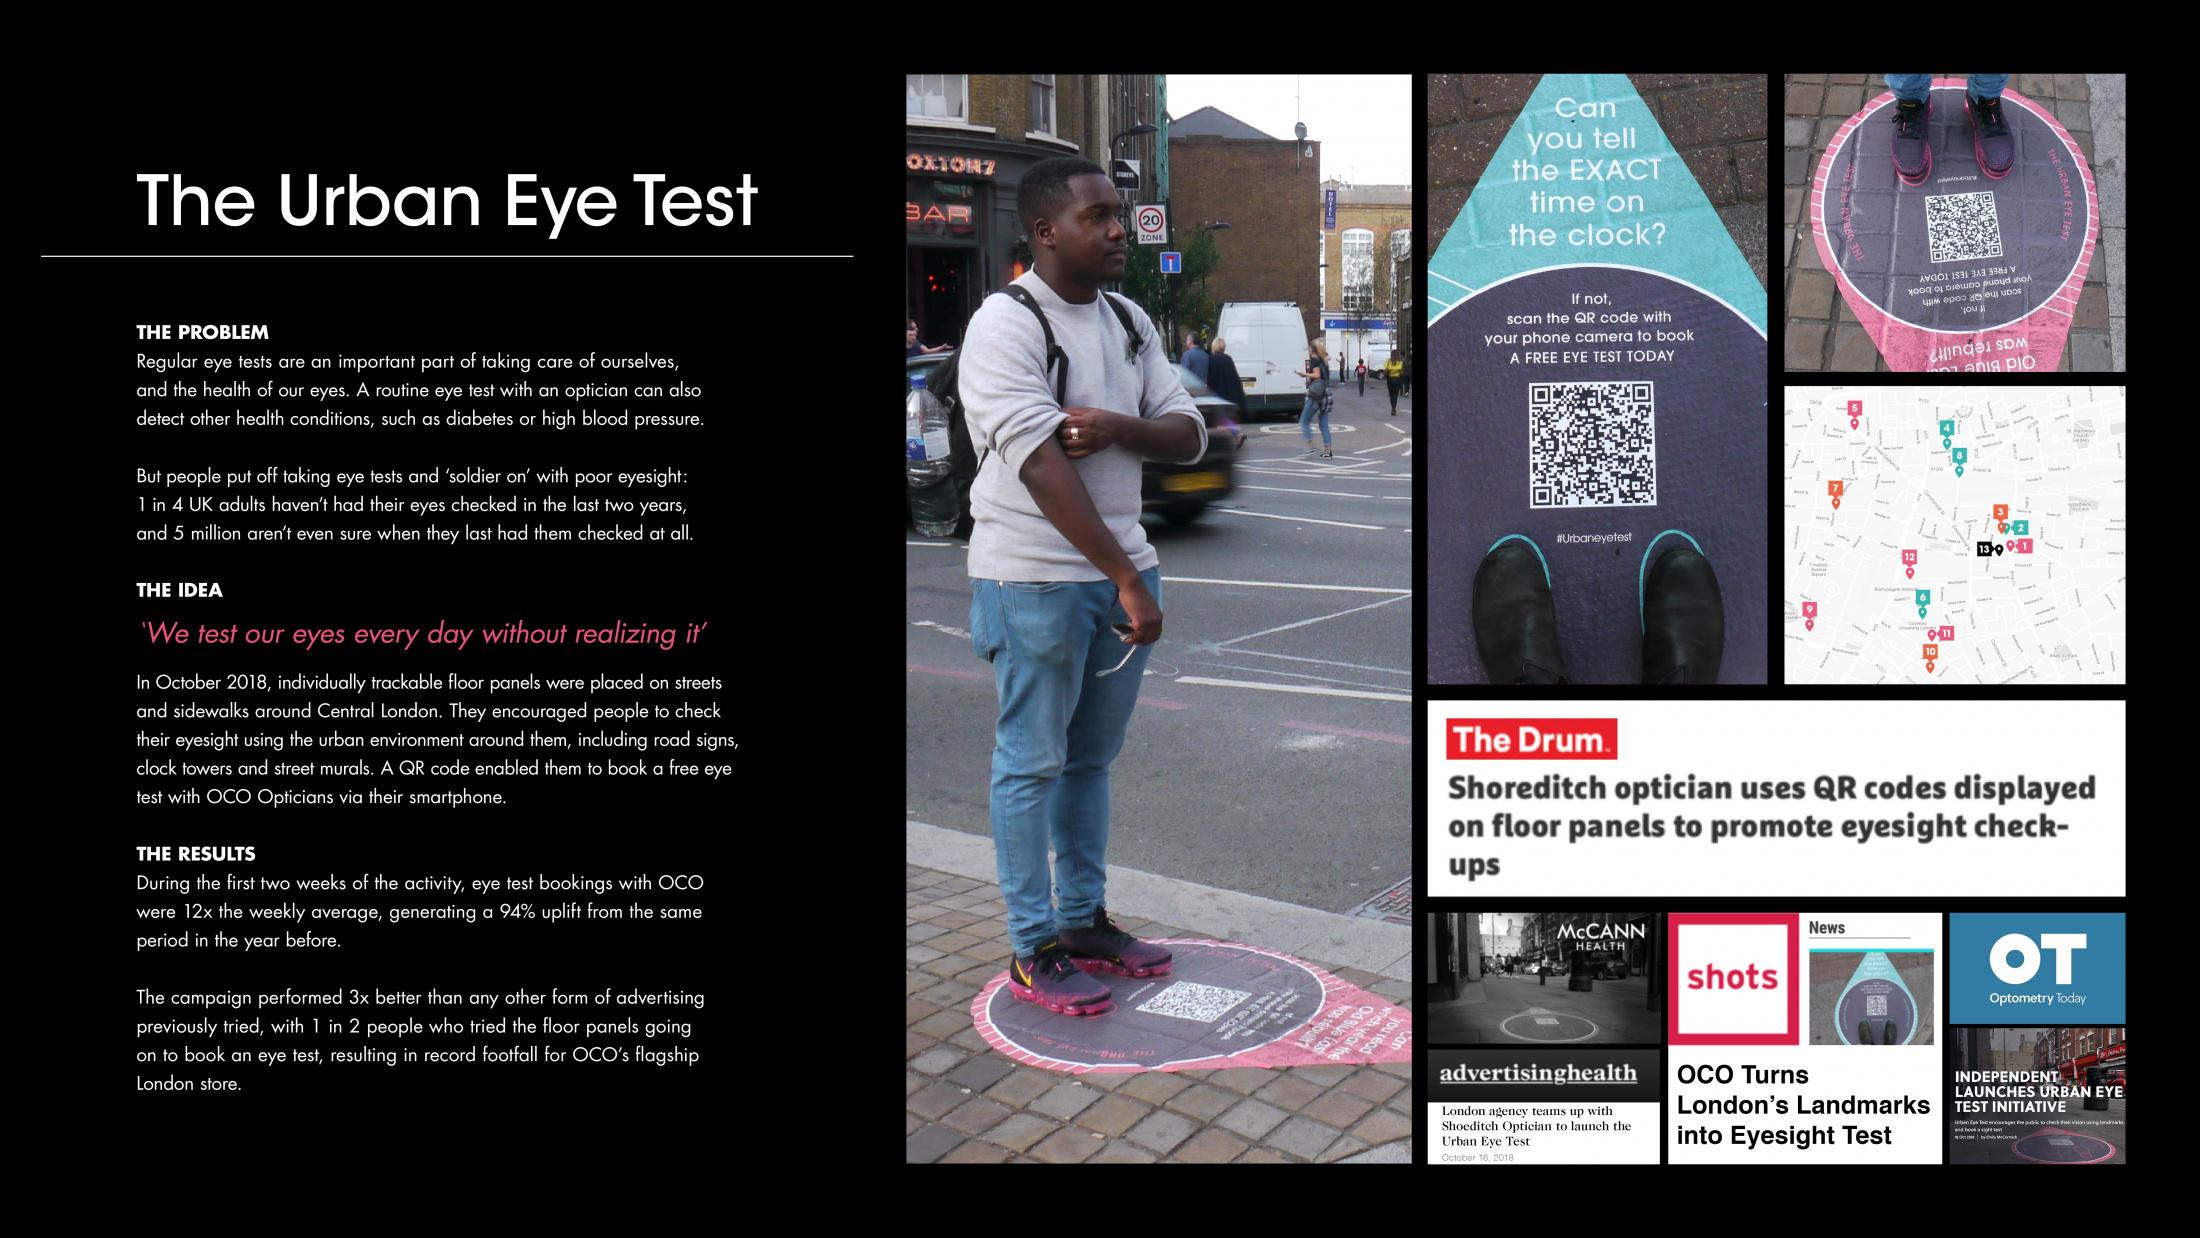 The Urban Eye Test Thumbnail